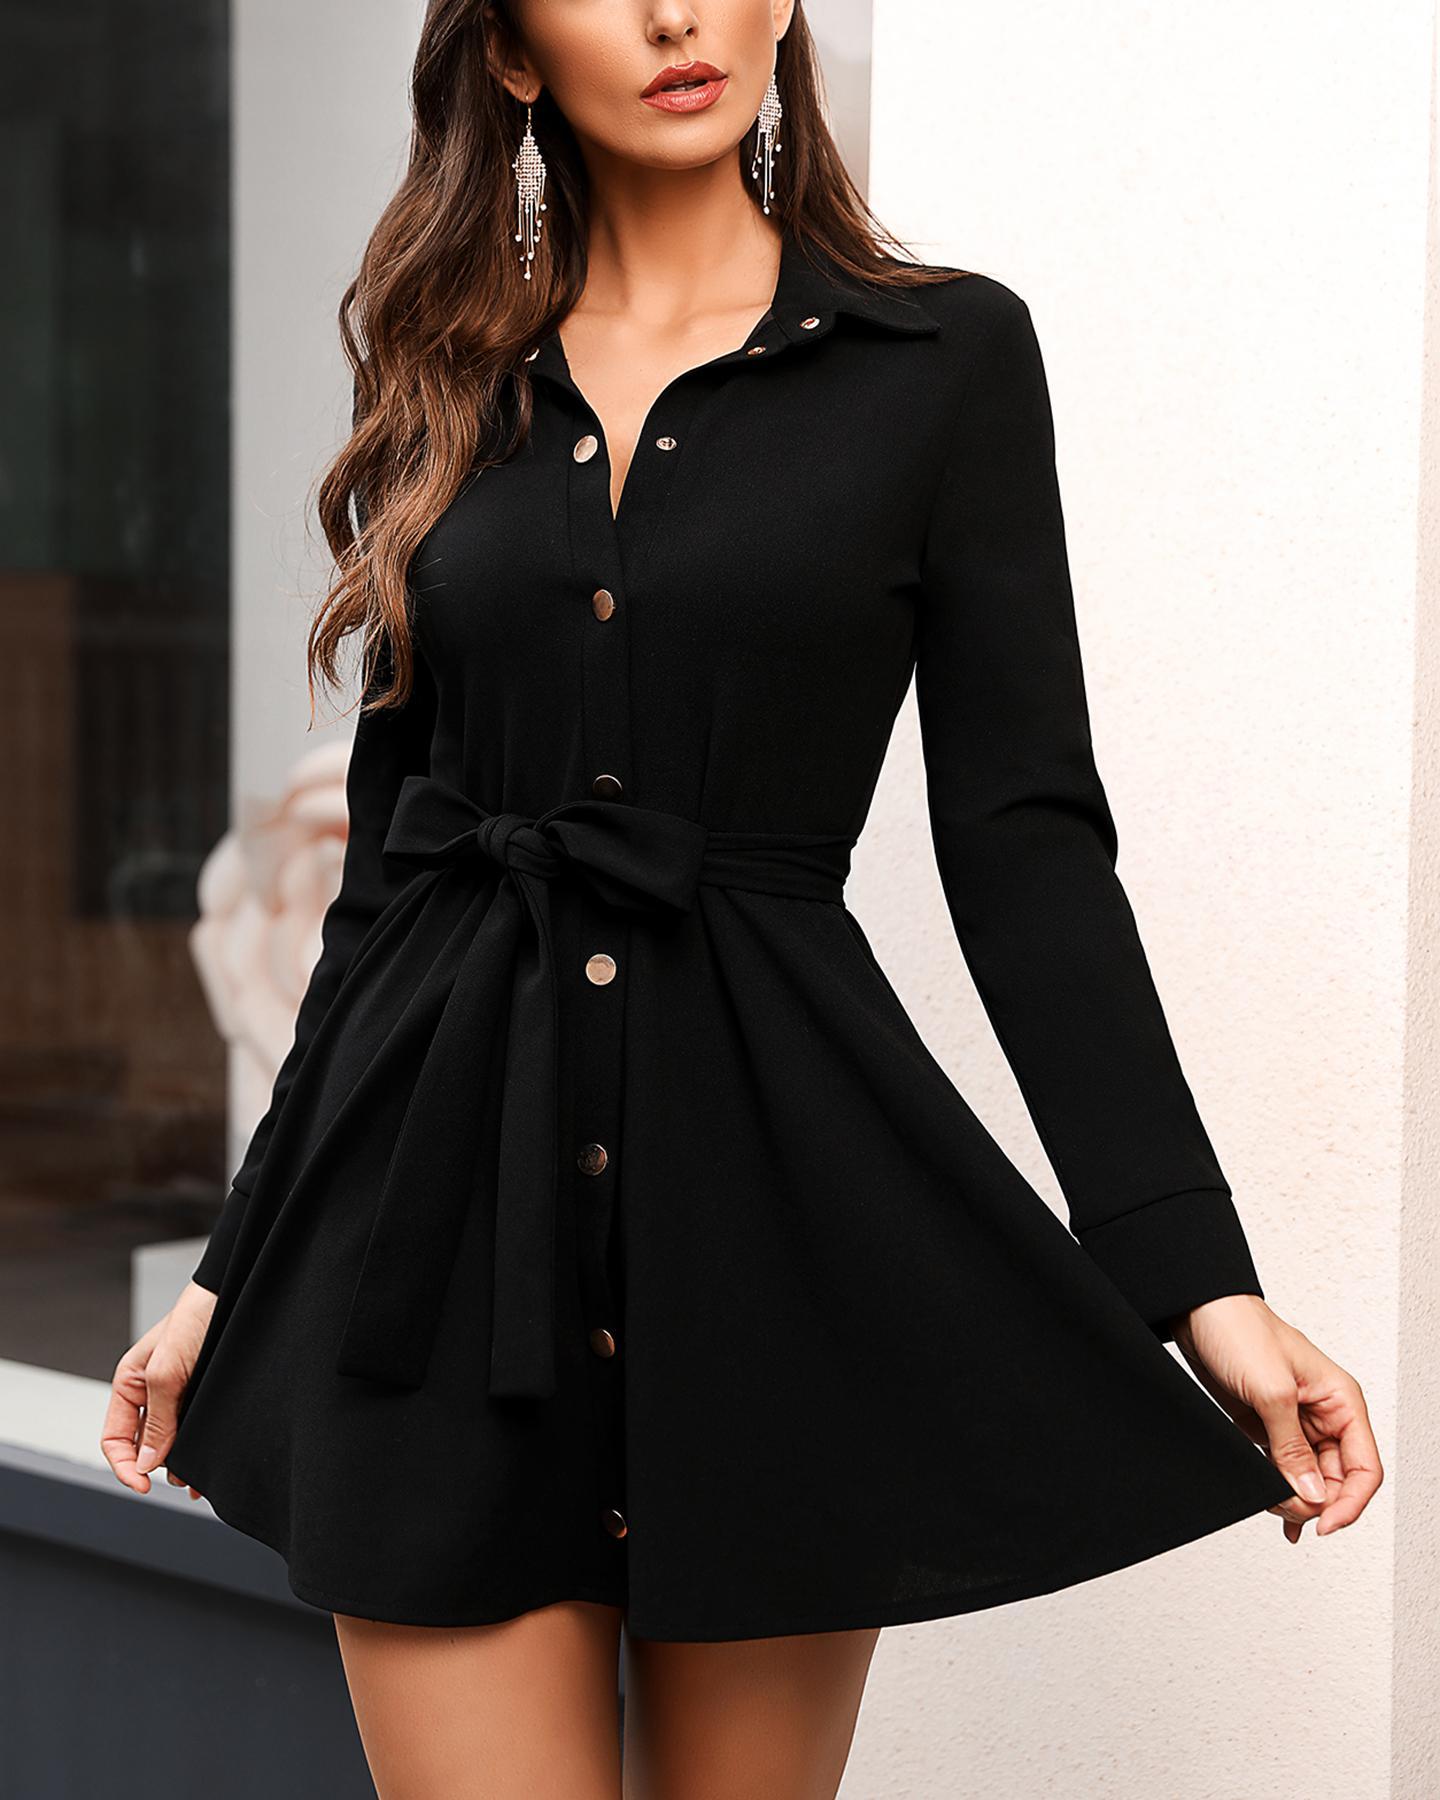 boutiquefeel / Button Up Ruffle Mini Dress